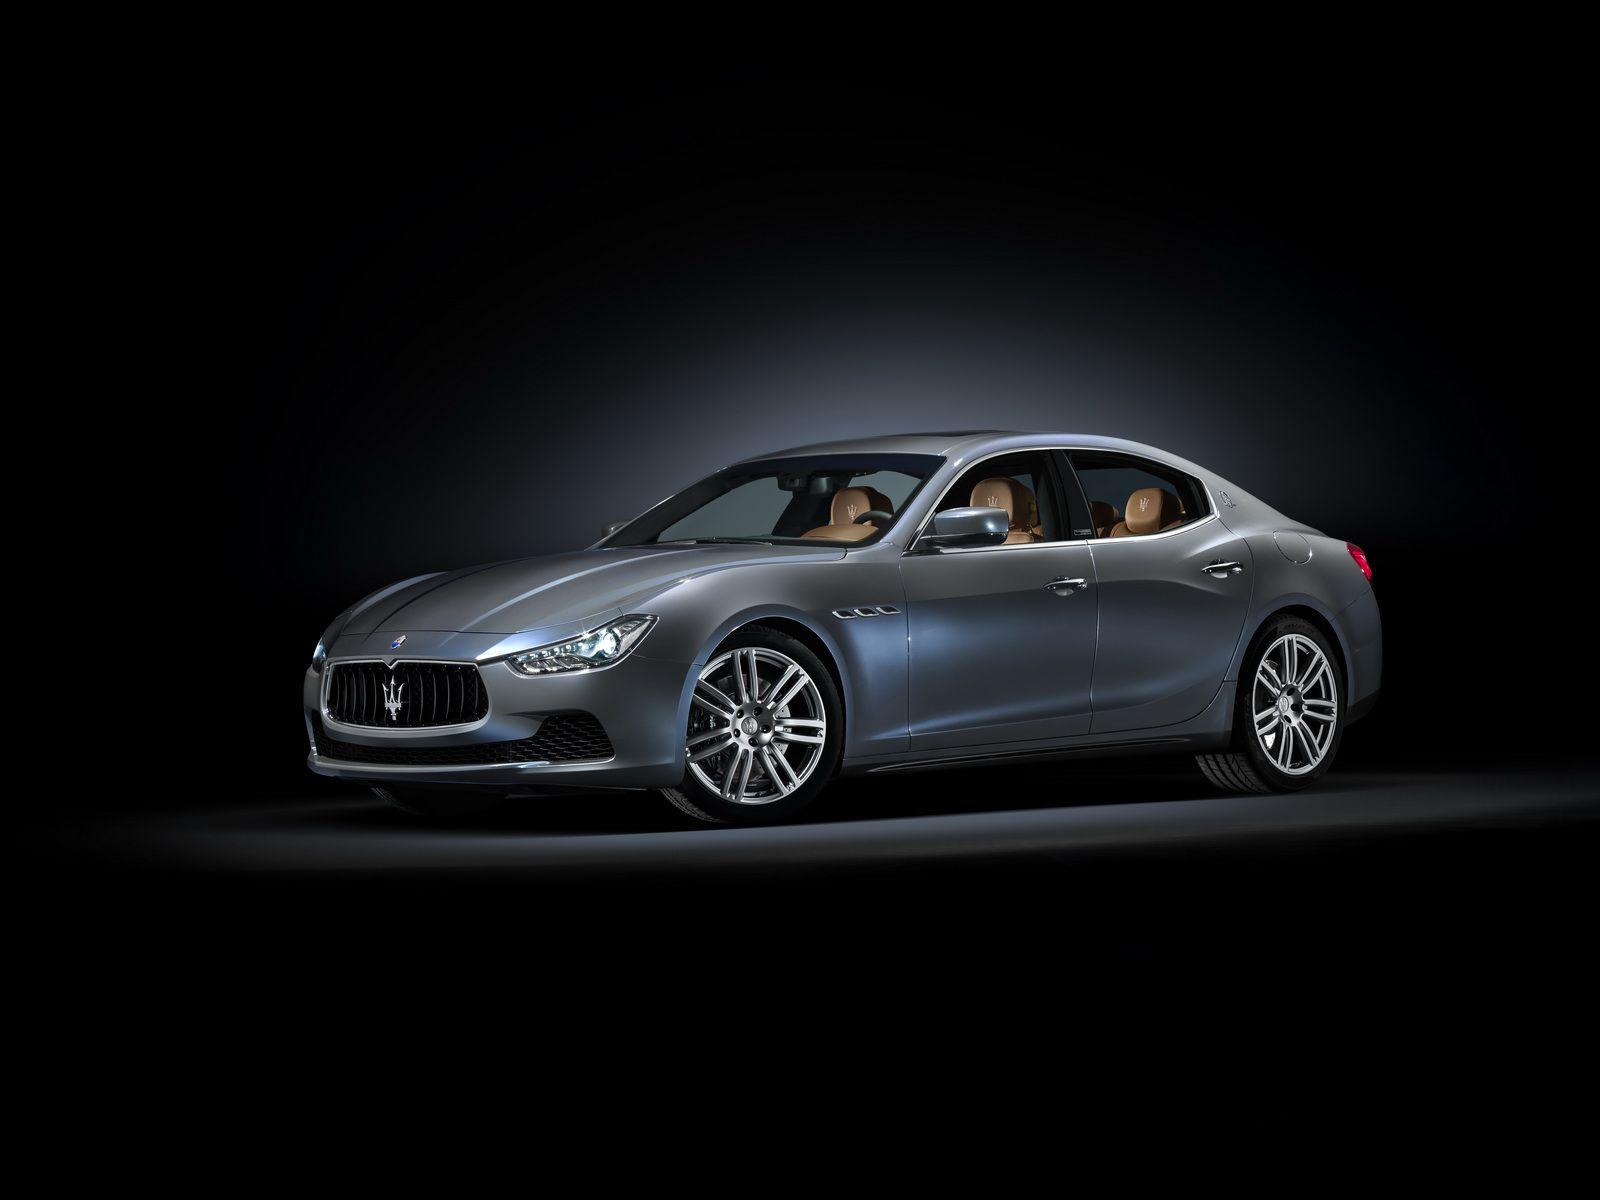 Maserati Ghibli Ermenegildo Zegna Edition: in soli 100 esemplari